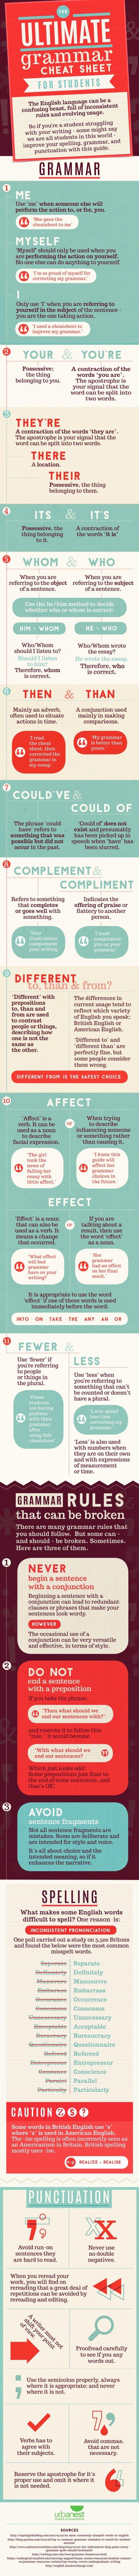 The Ultimate English Grammar Cheat Sheet Infographic English Grammar English Grammar Rules Grammar Rules [ 9999 x 540 Pixel ]